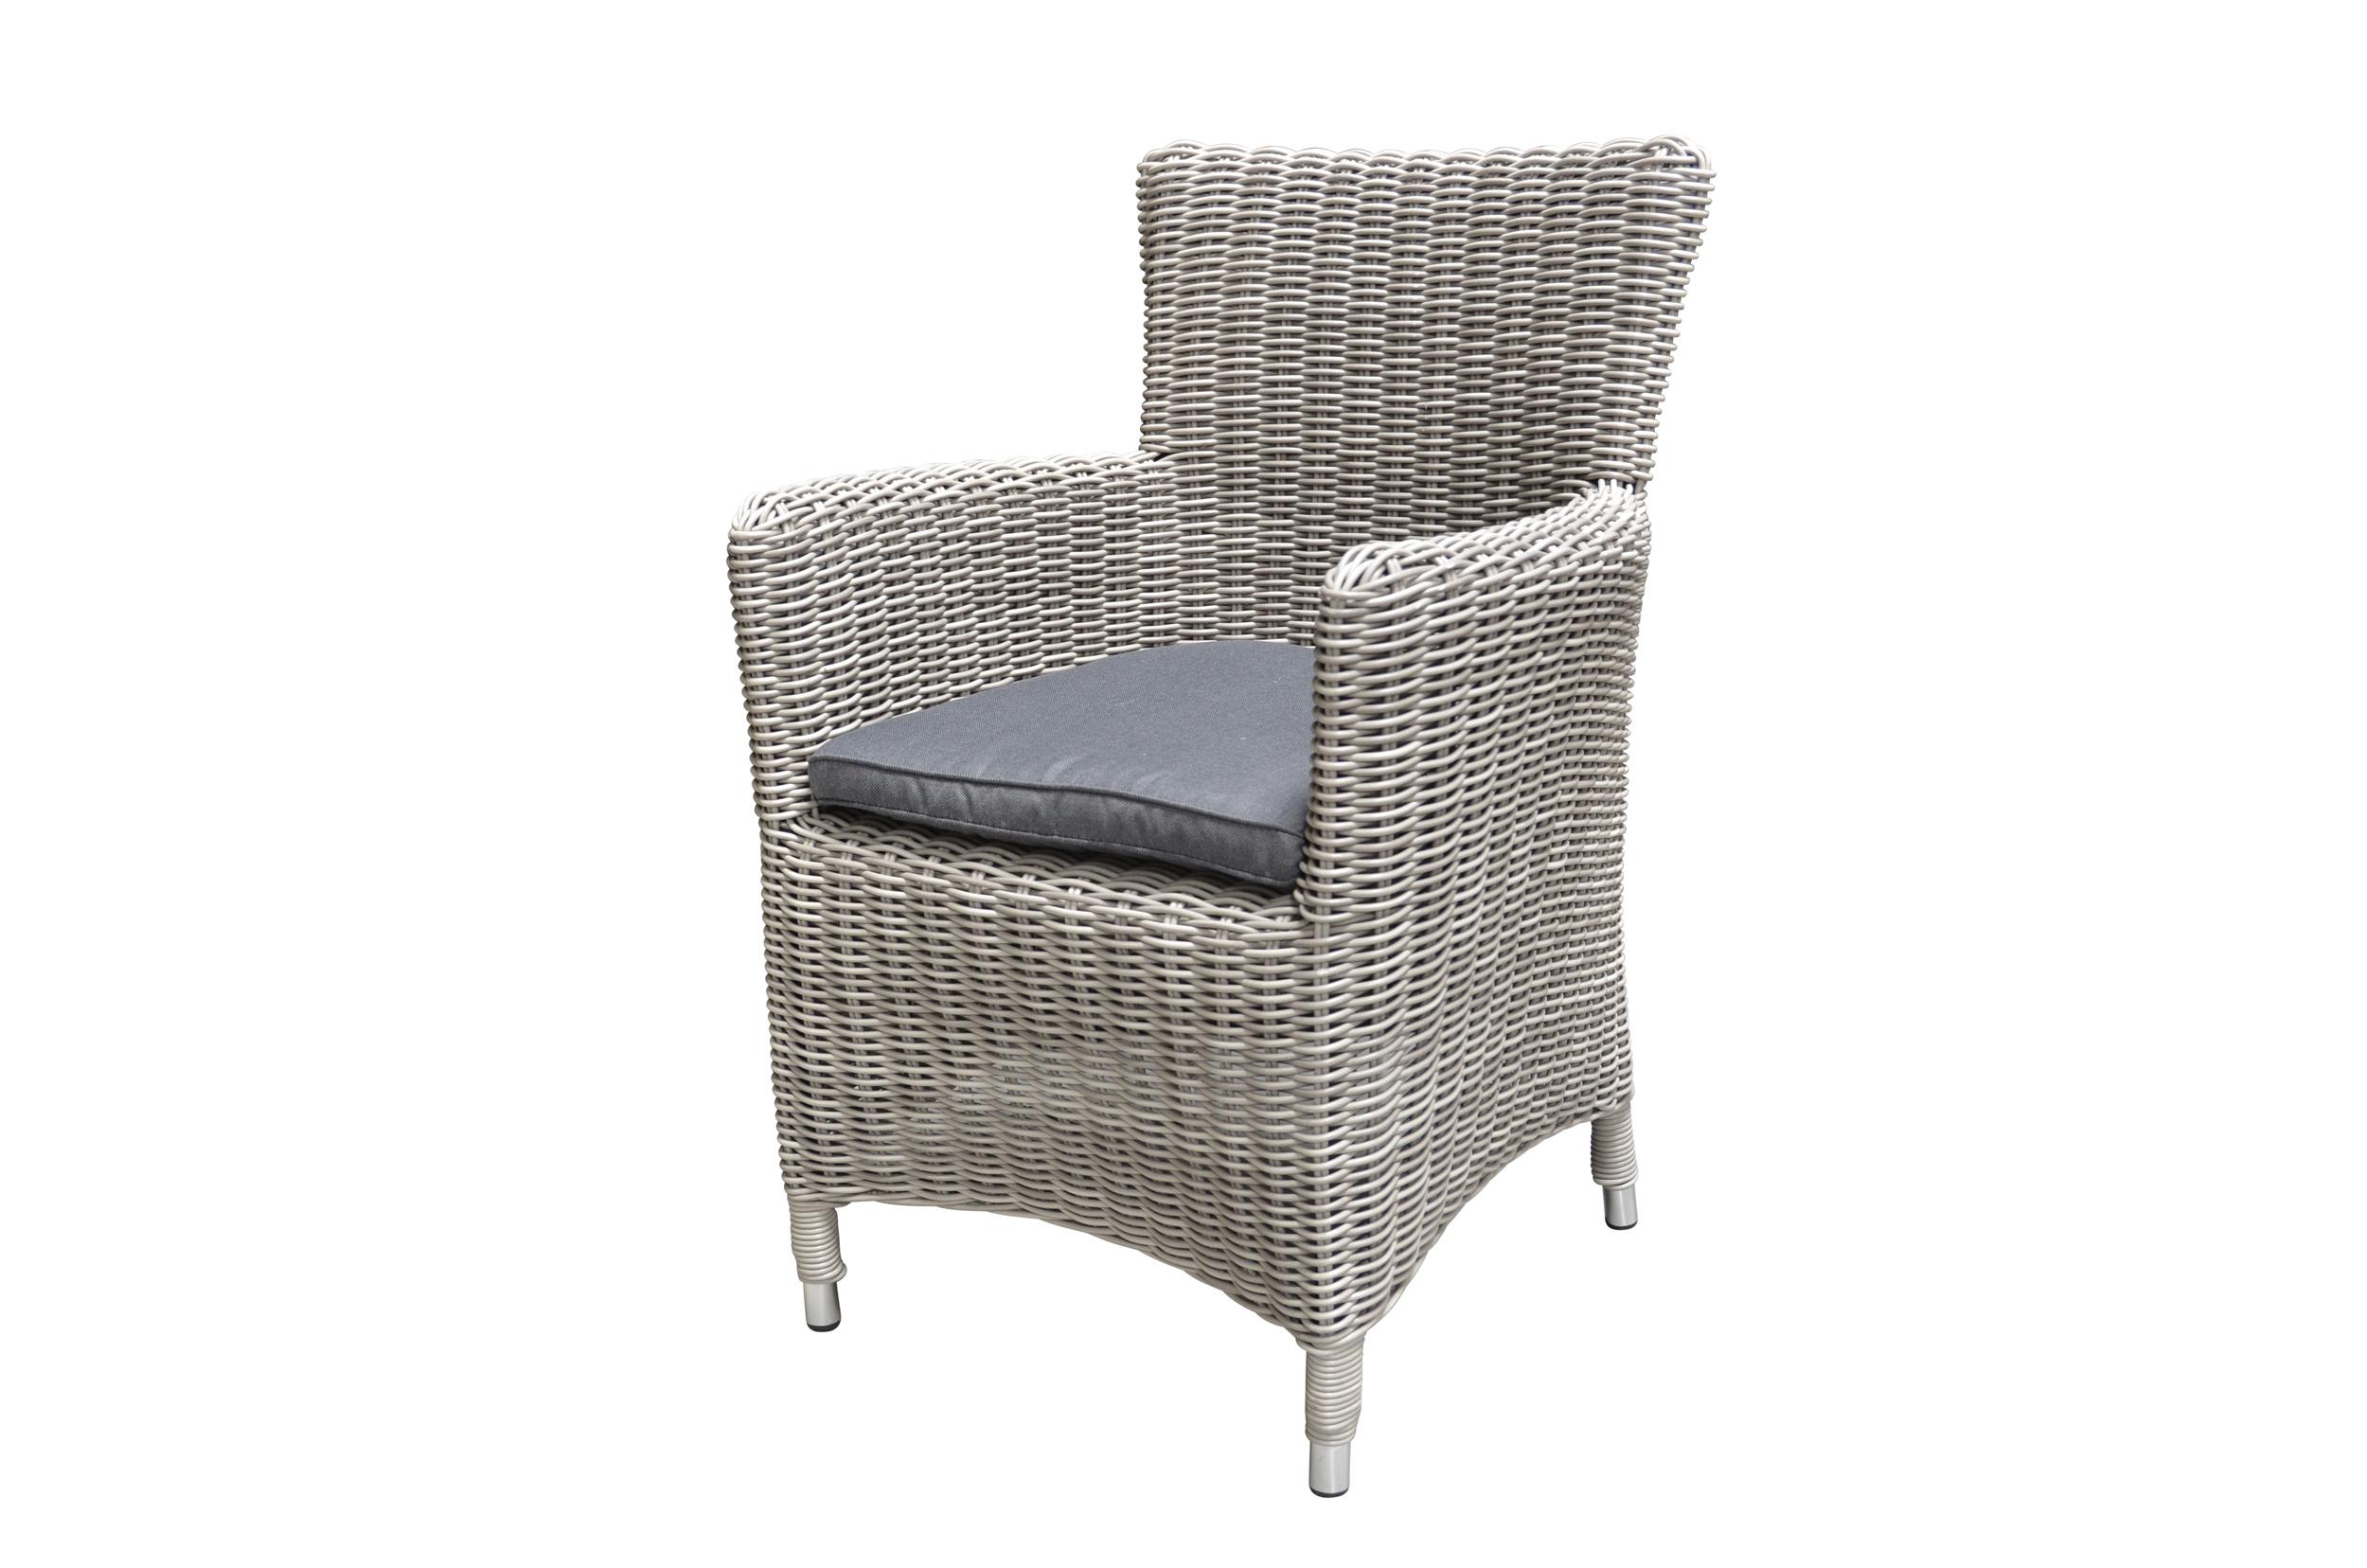 Rieten Stoel Kwantum : Kwantum stoelen roze stunning rieten stoel kwantum with rieten